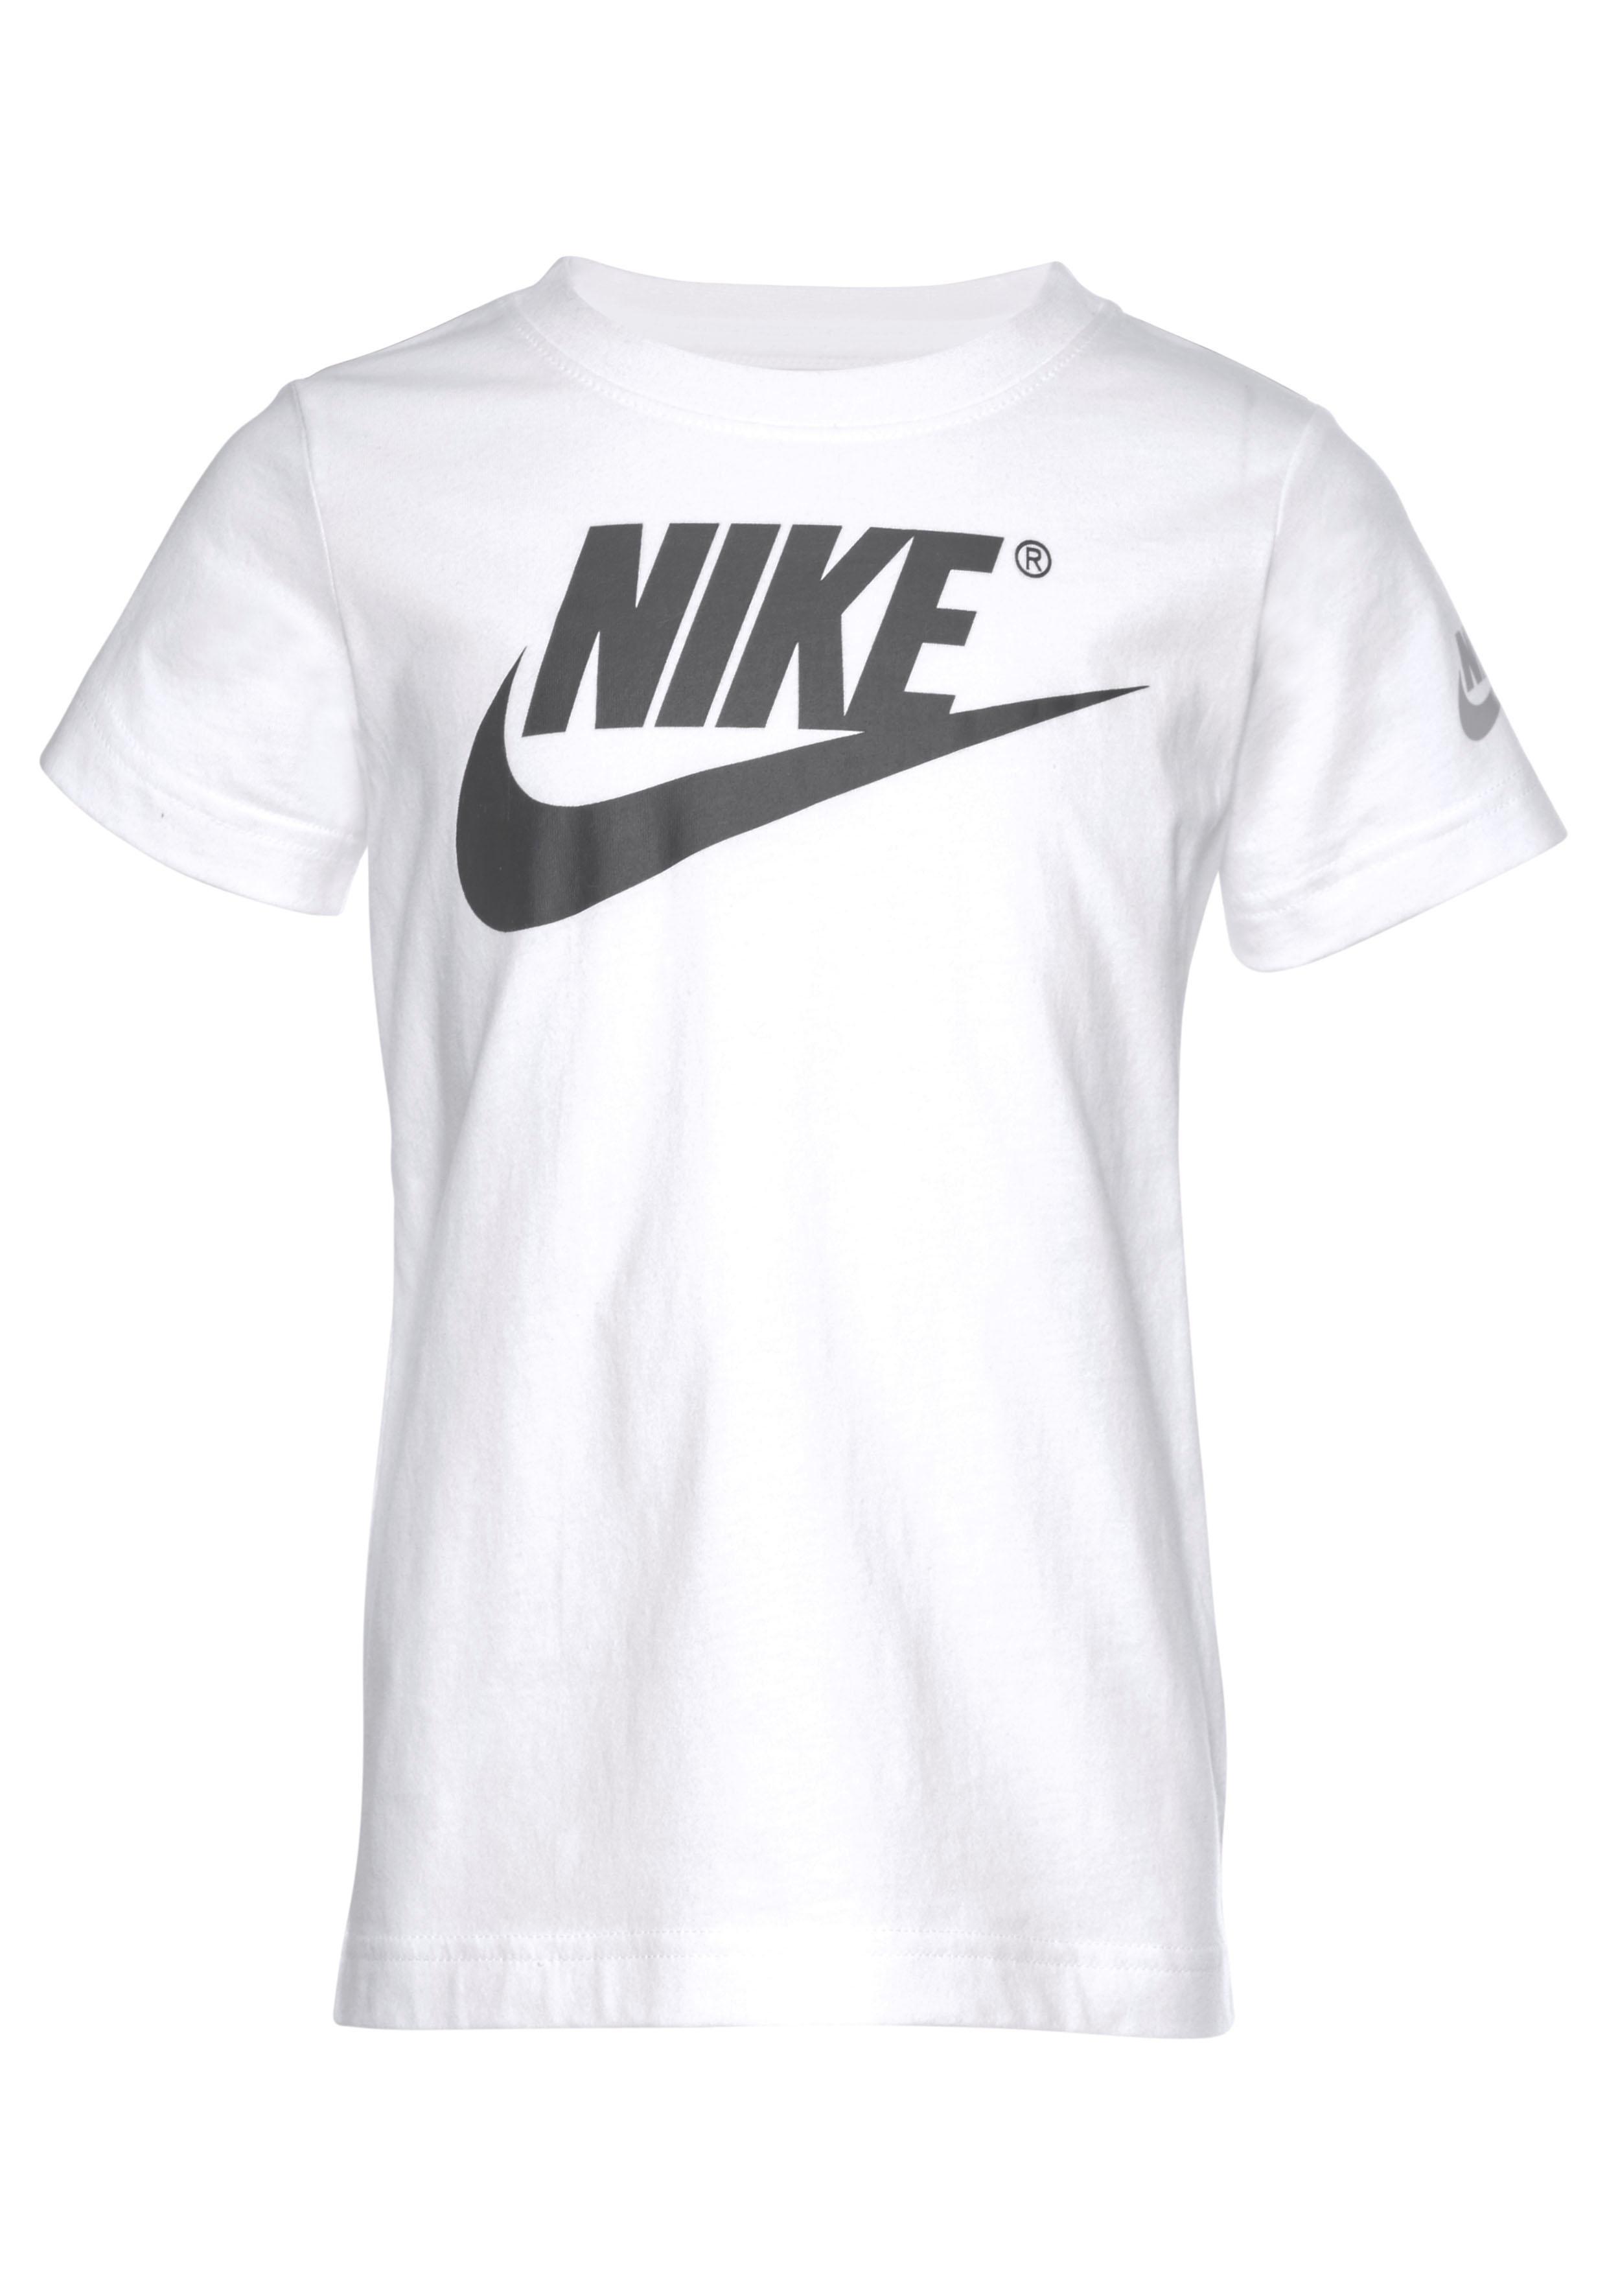 sports shoes 27185 2483e Afbeeldingsbron  Nike Sportswear T-shirt »NIKE SPORTSWEAR THE FUTURA ISMINE  SHORTSLEEVE TEE«